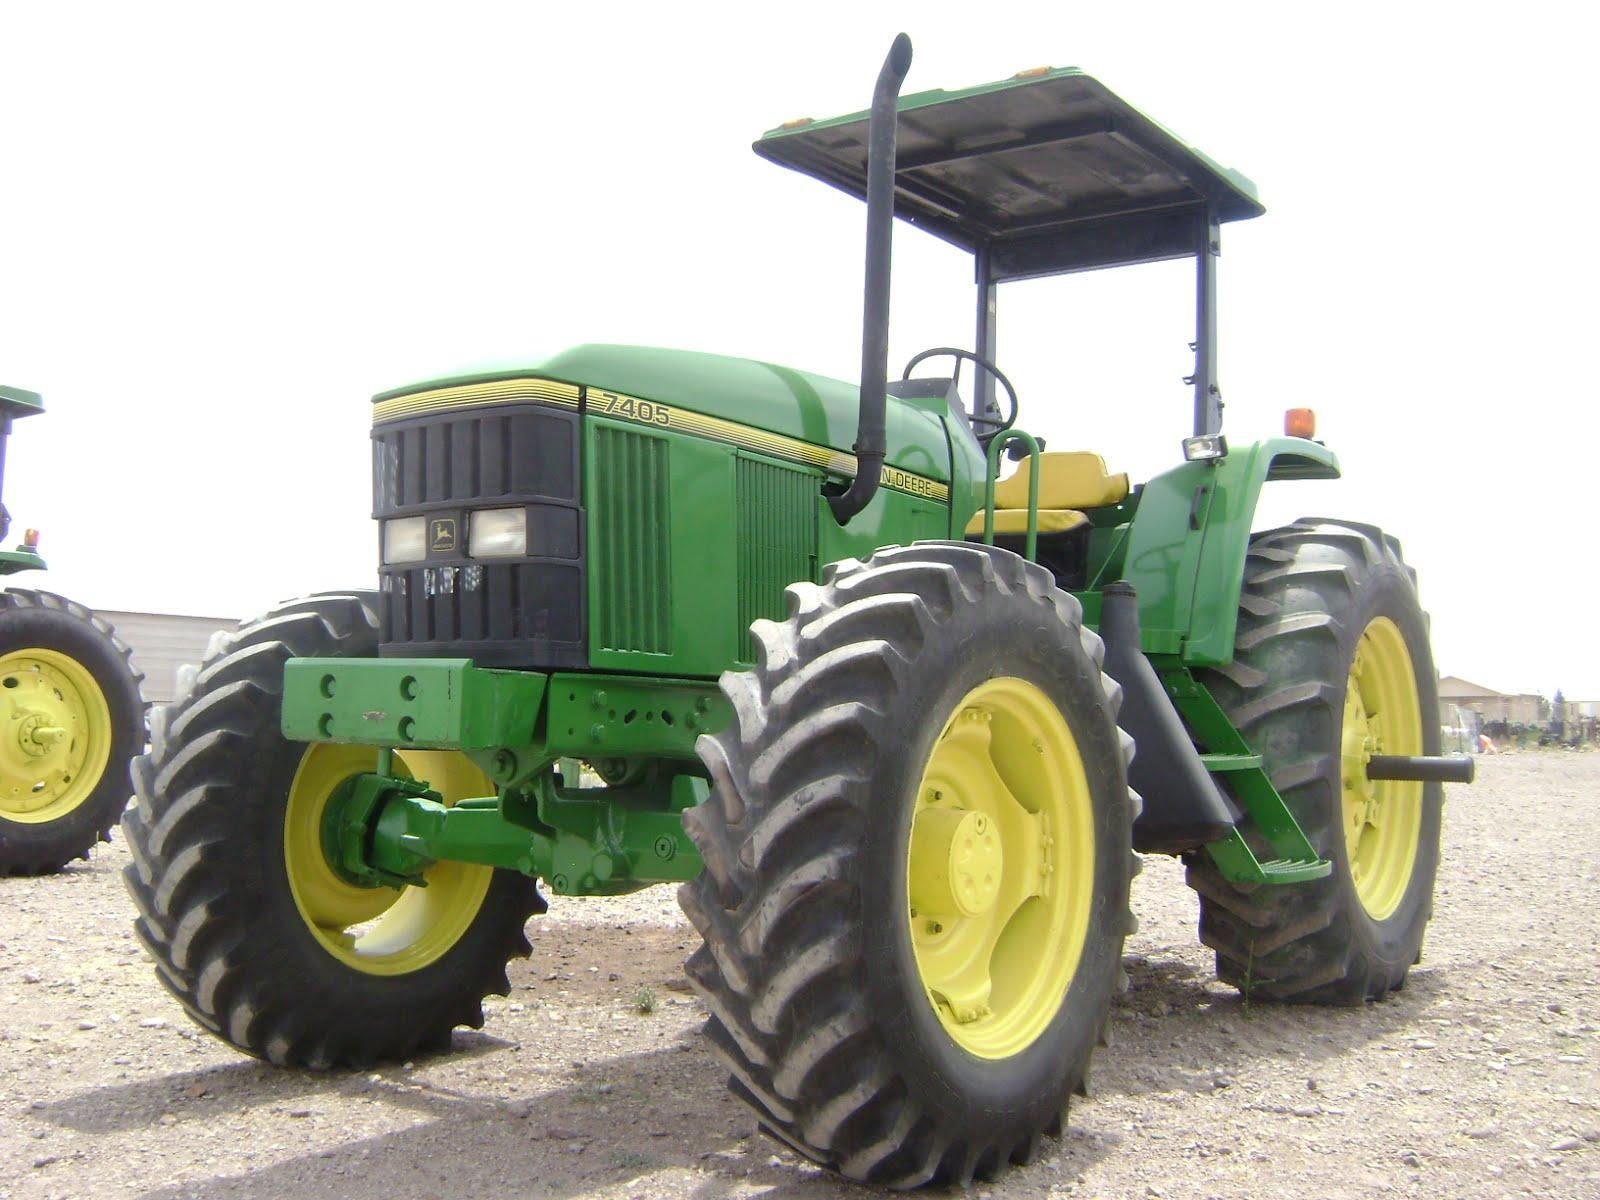 MAQUINARIA AGRICOLA INDUSTRIAL: Tractor John Deere 7405 ...